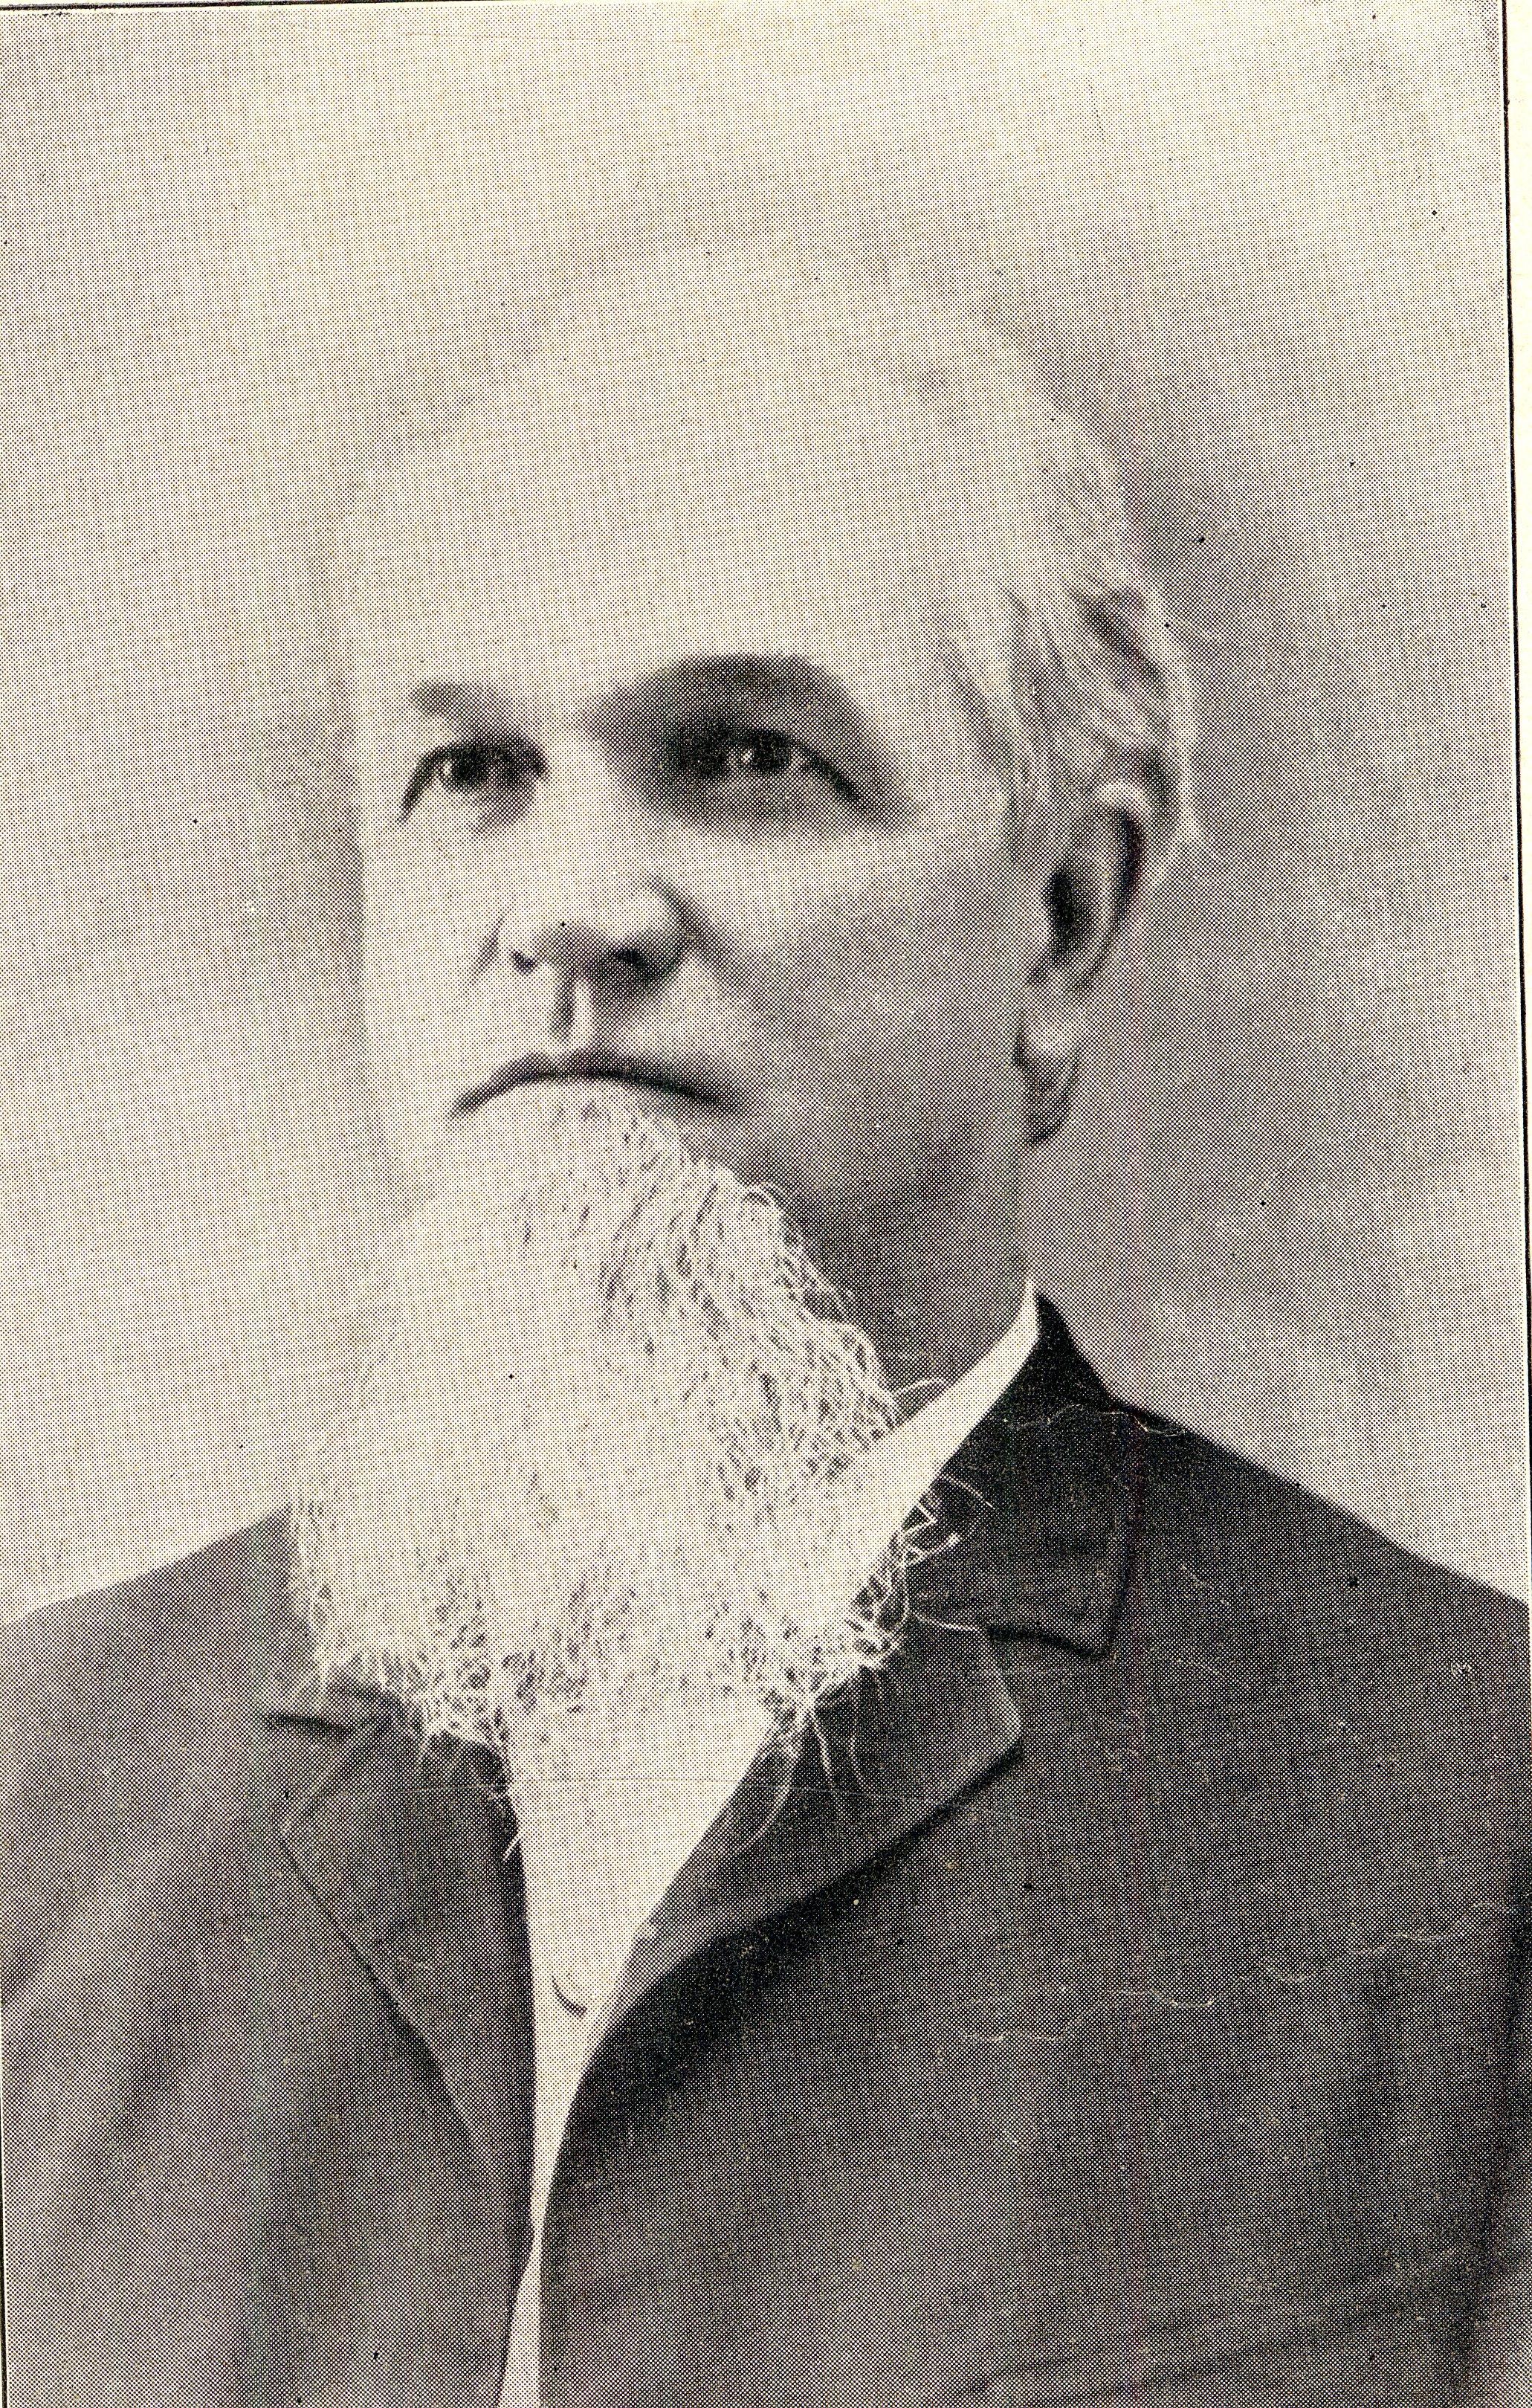 John Baker, Professor at Young's Female College, c.1895